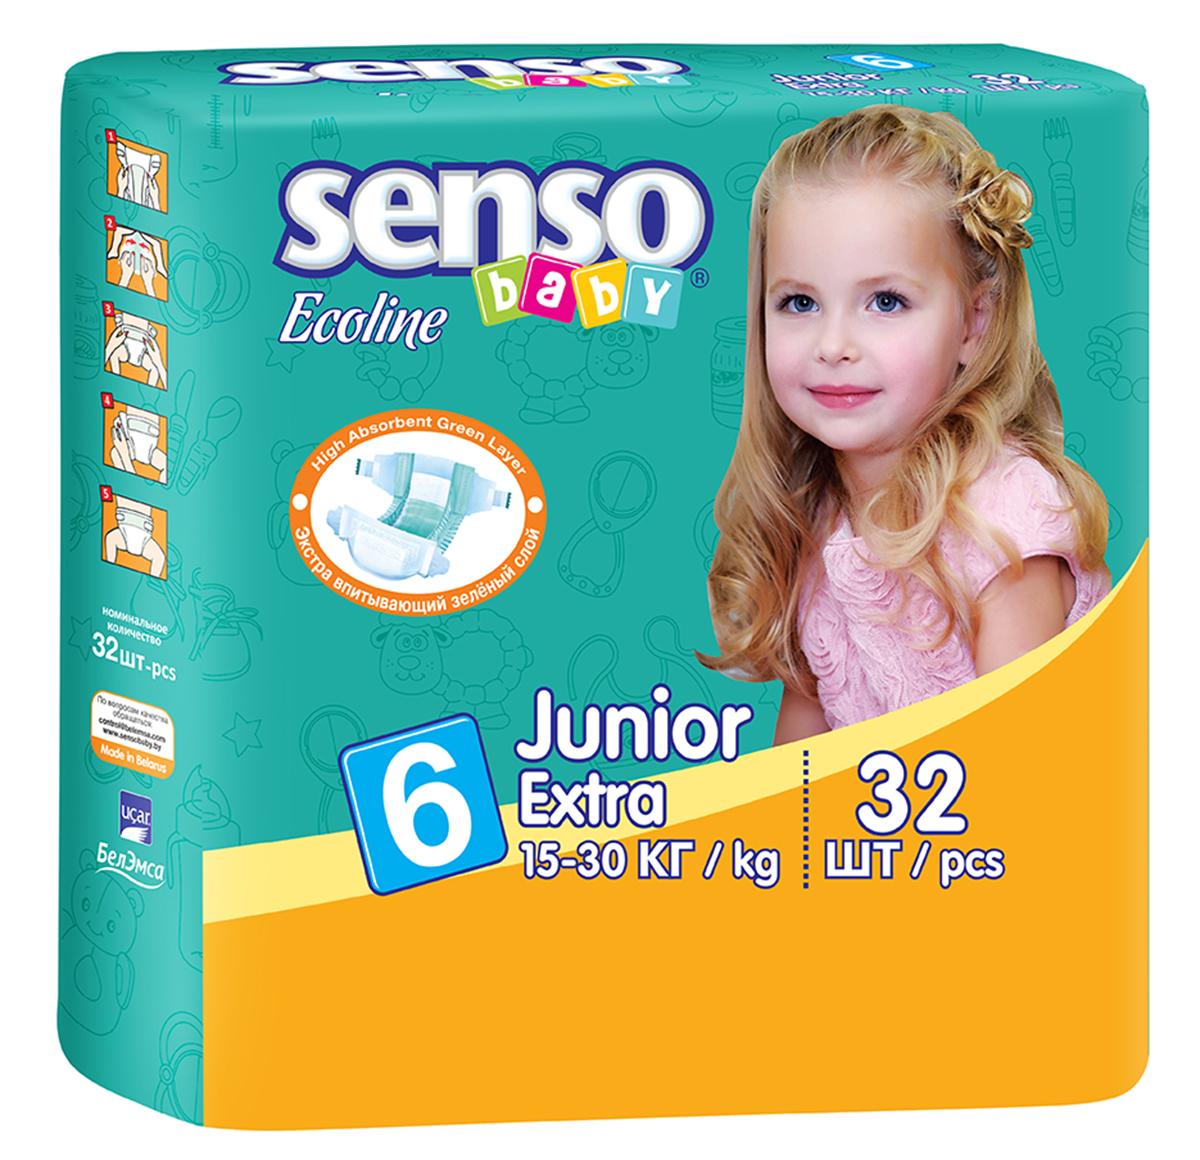 Senso Baby Ecoline Подгузники Junior Extra 15-30 кг 32 шт onex 3d pic ecoline explore